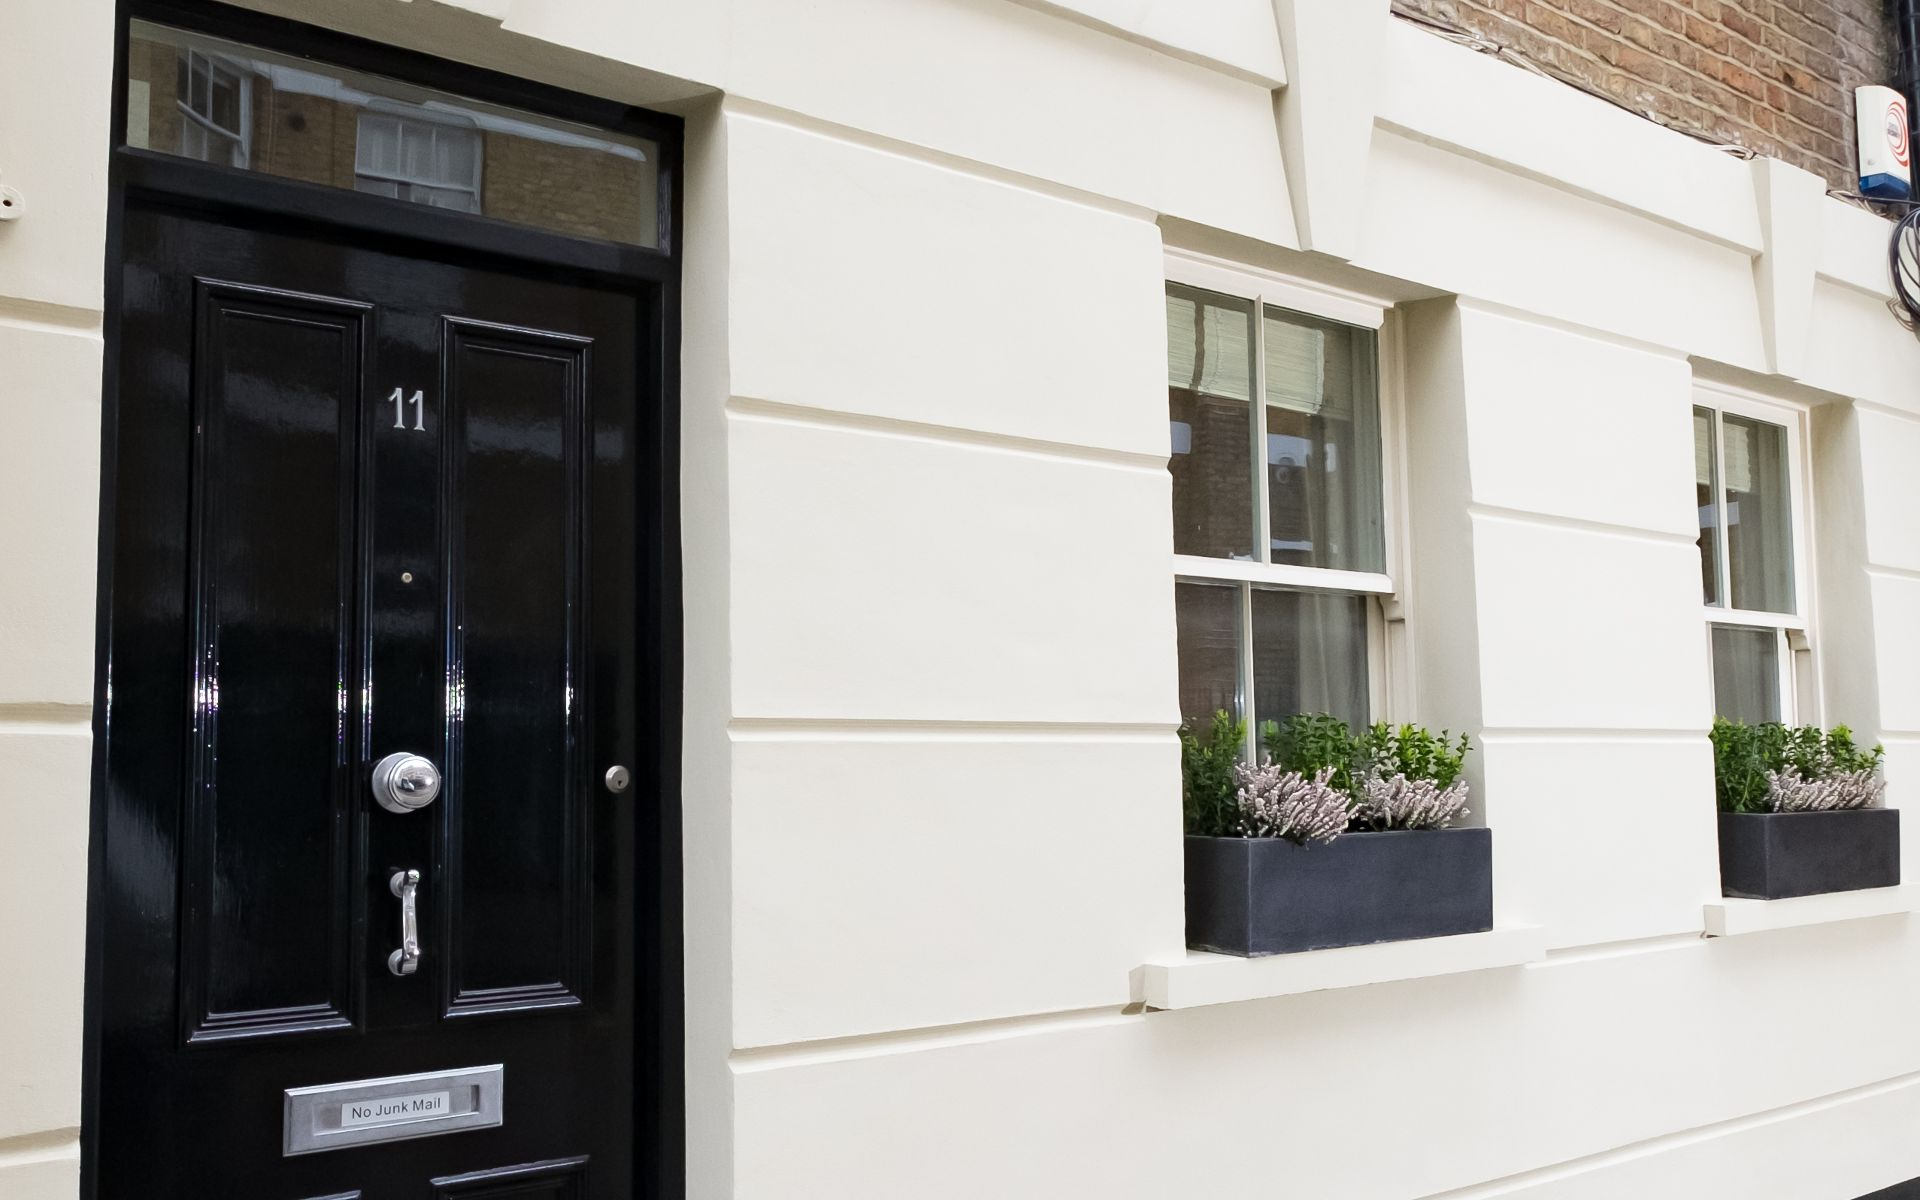 London Building Project Management minor refurbishment